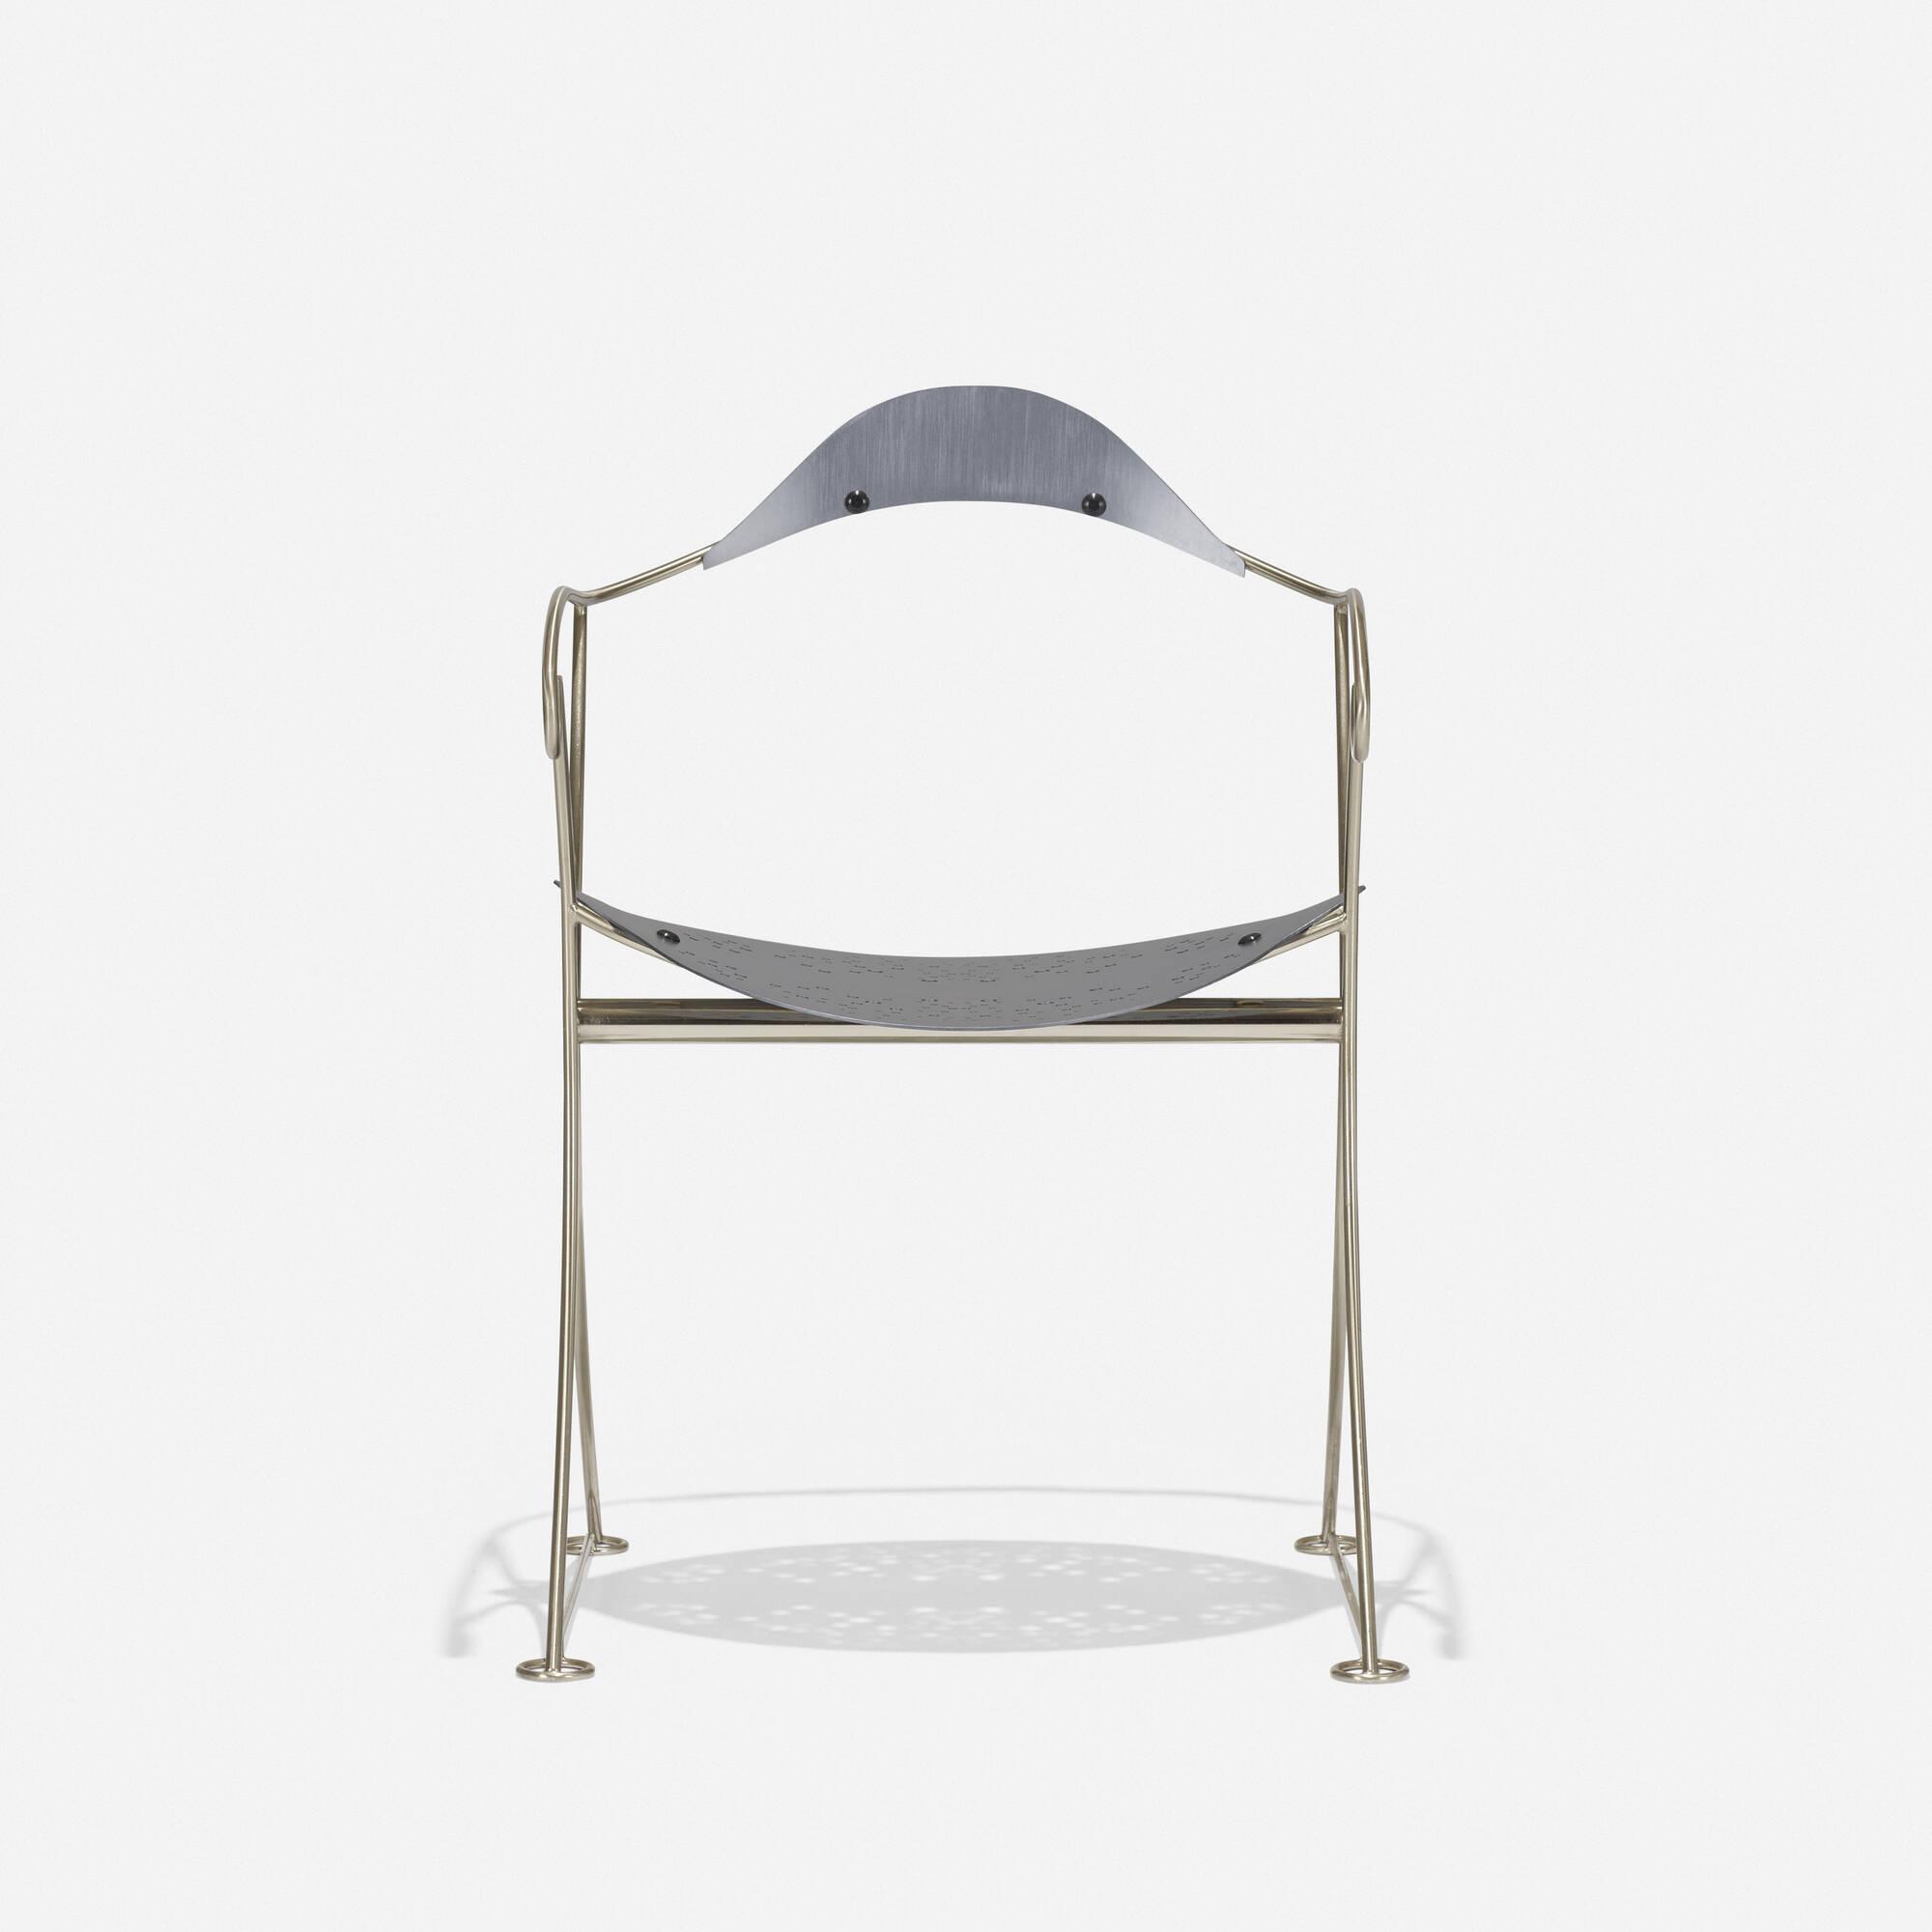 412: Riccardo Dalisi / Clessidra chair (2 of 3)